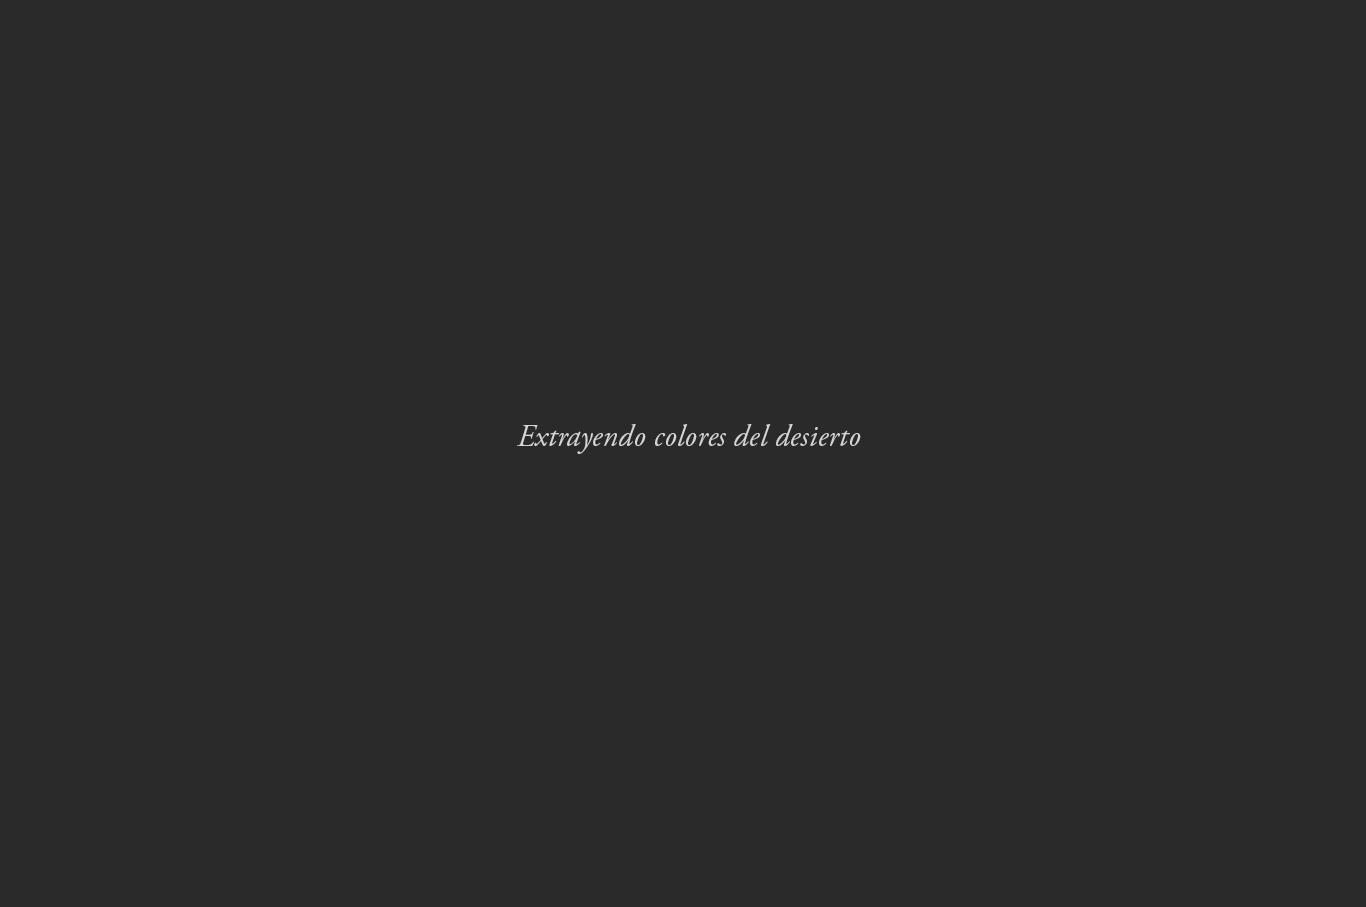 texto_3.jpg